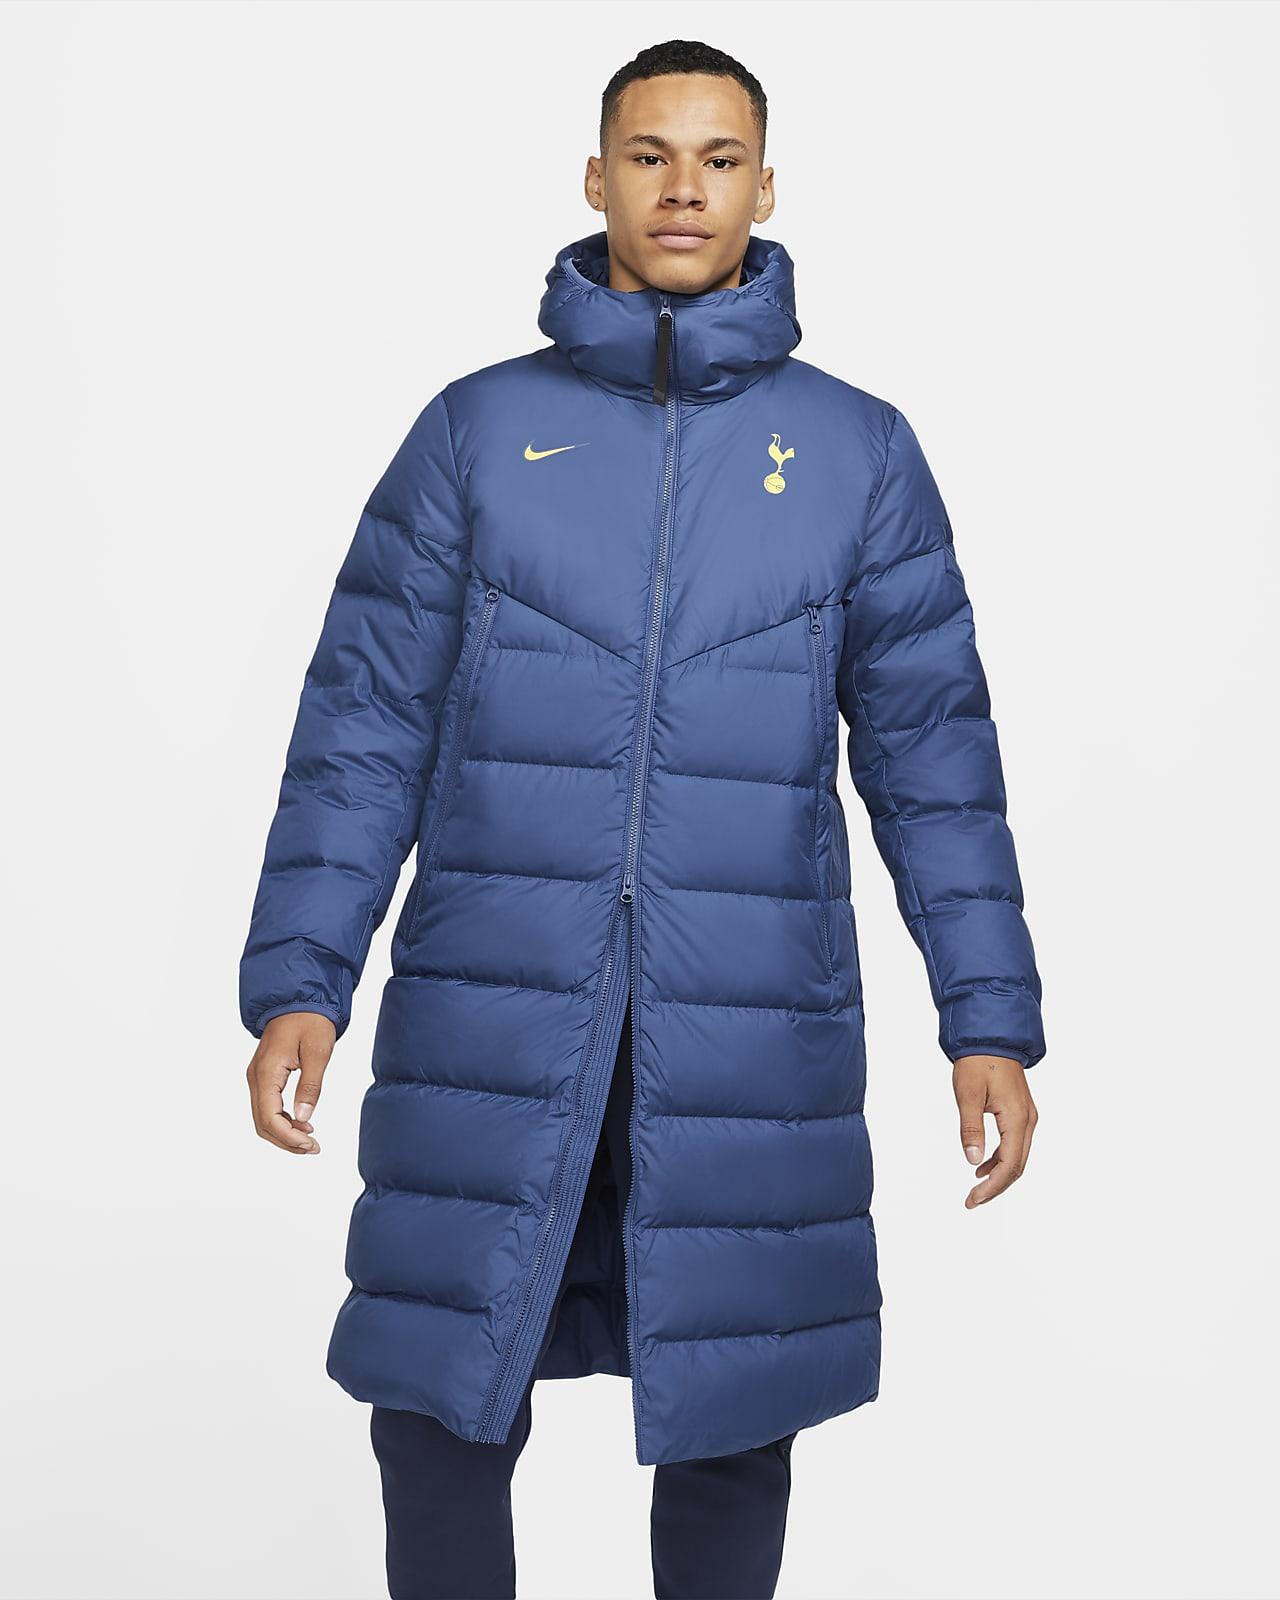 Tottenham Hotspur Strike Men's Football Down Jacket